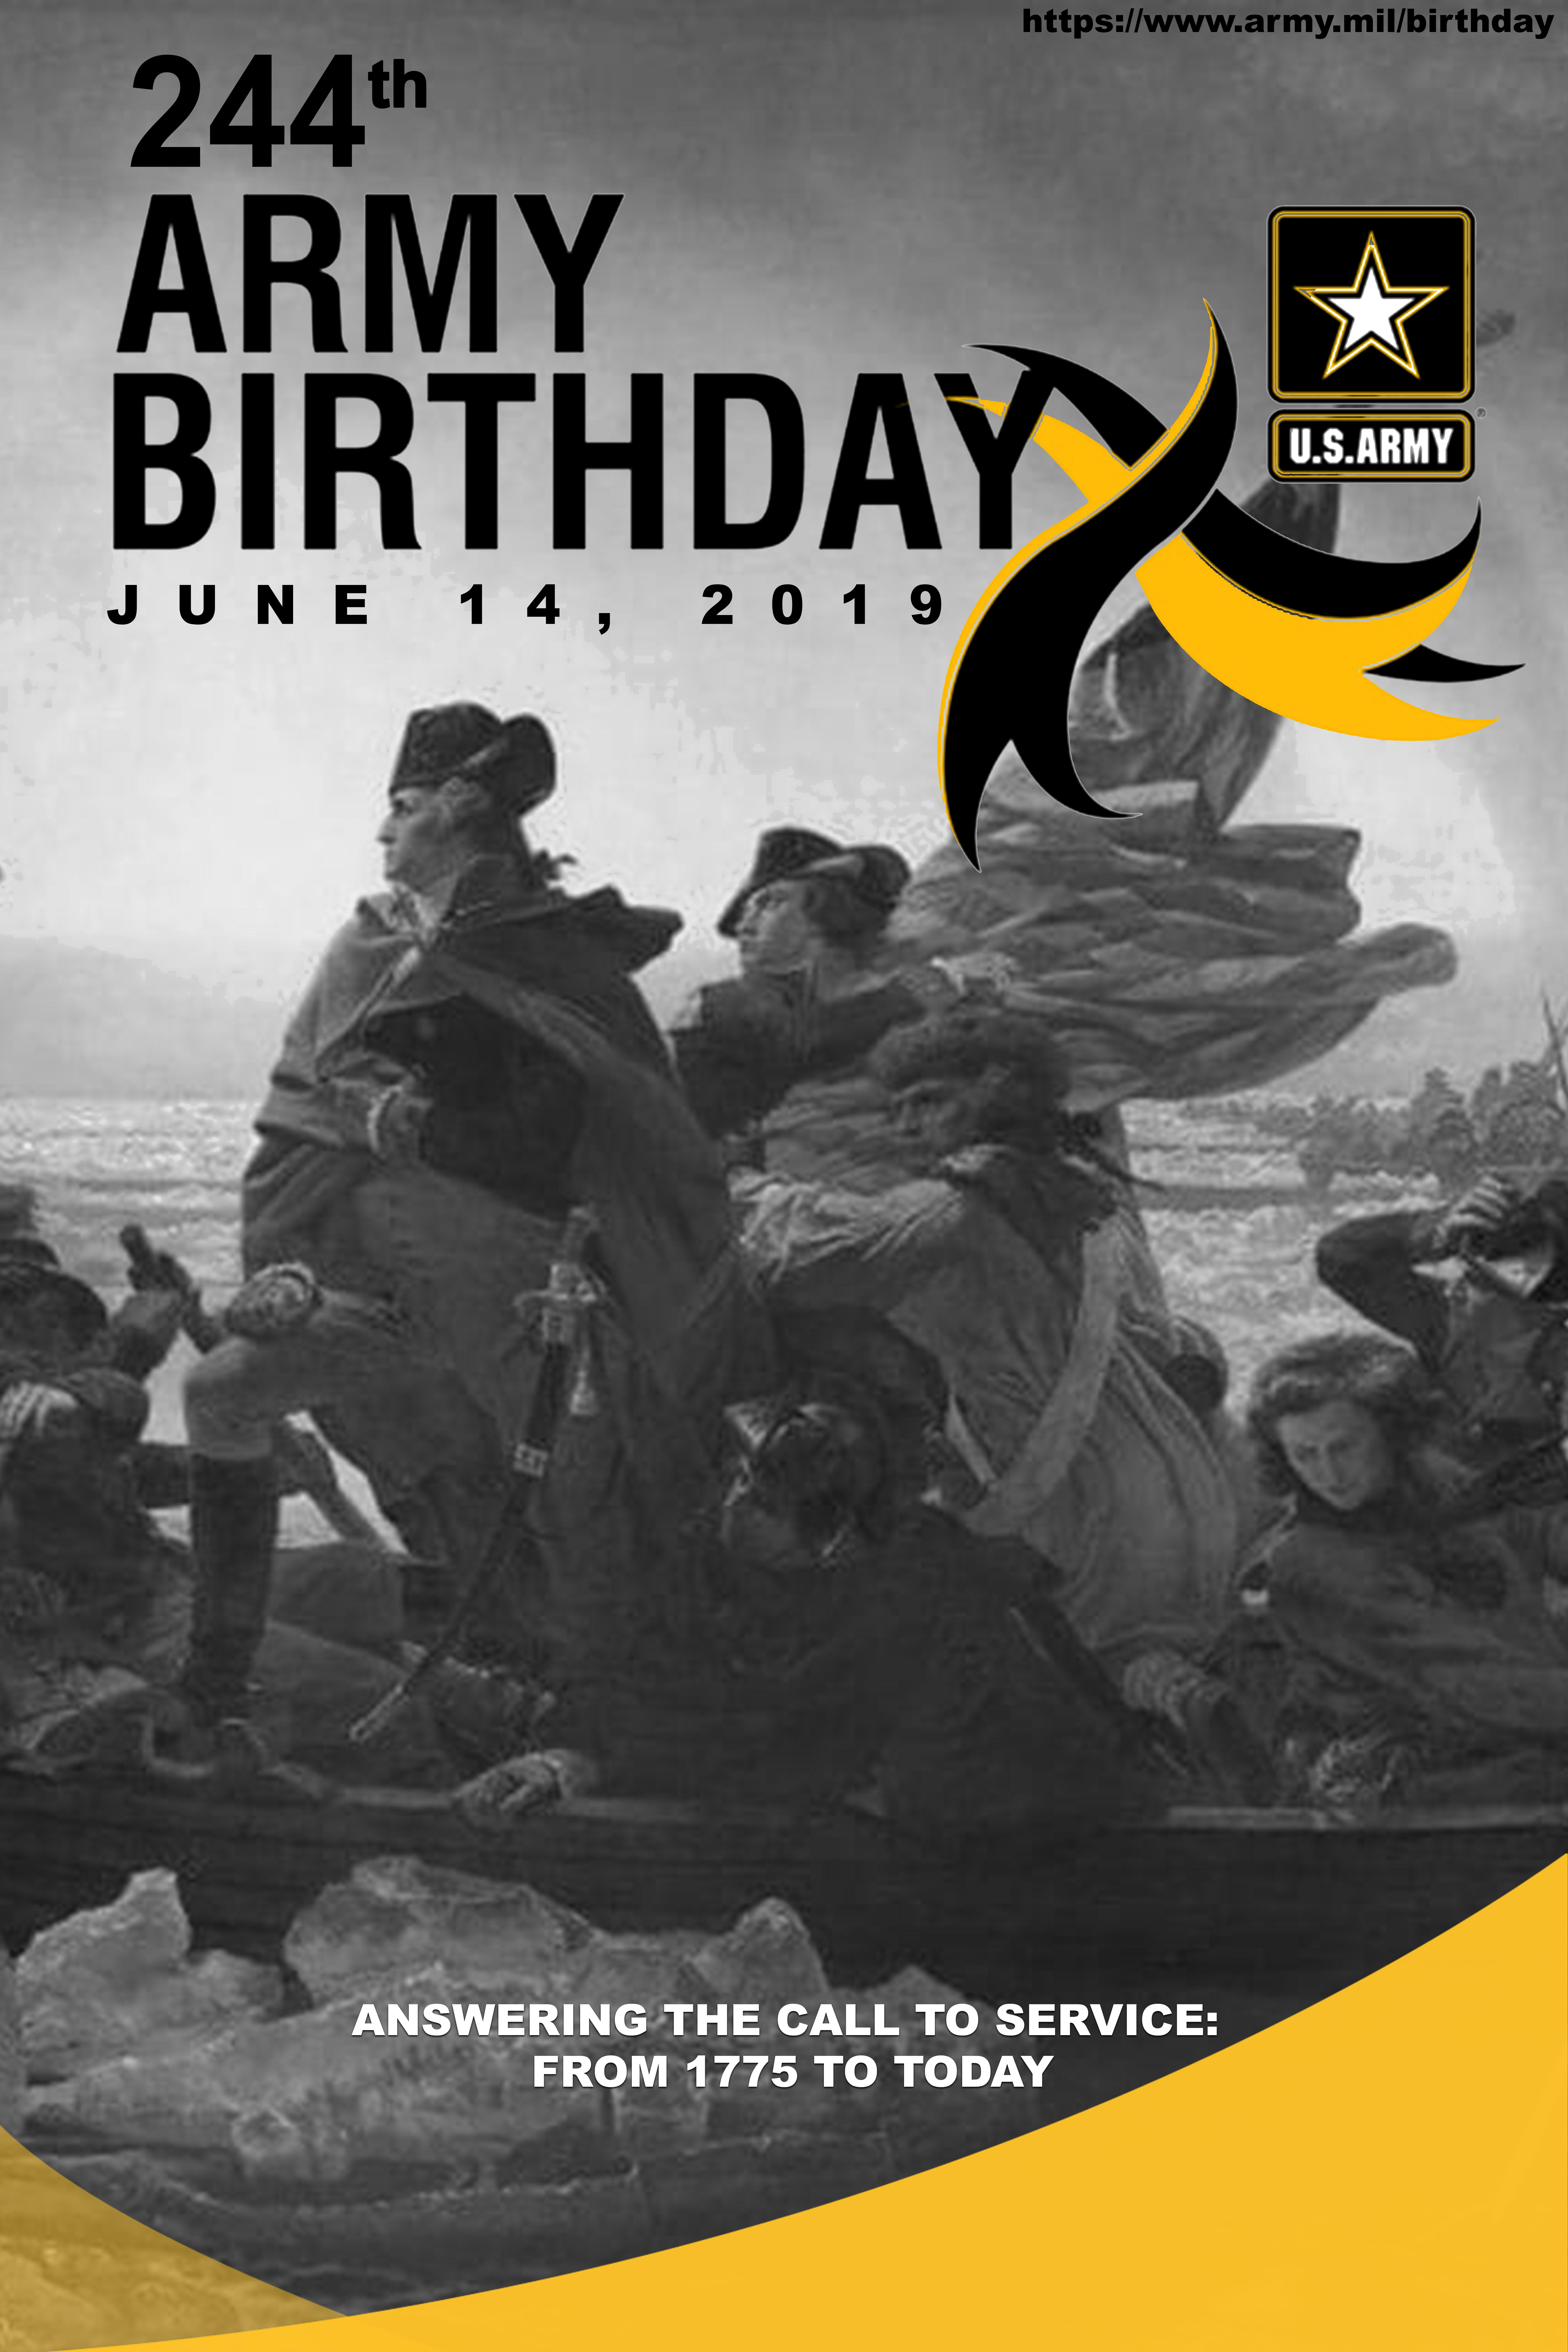 244th Army Birthday Poster design(1775)